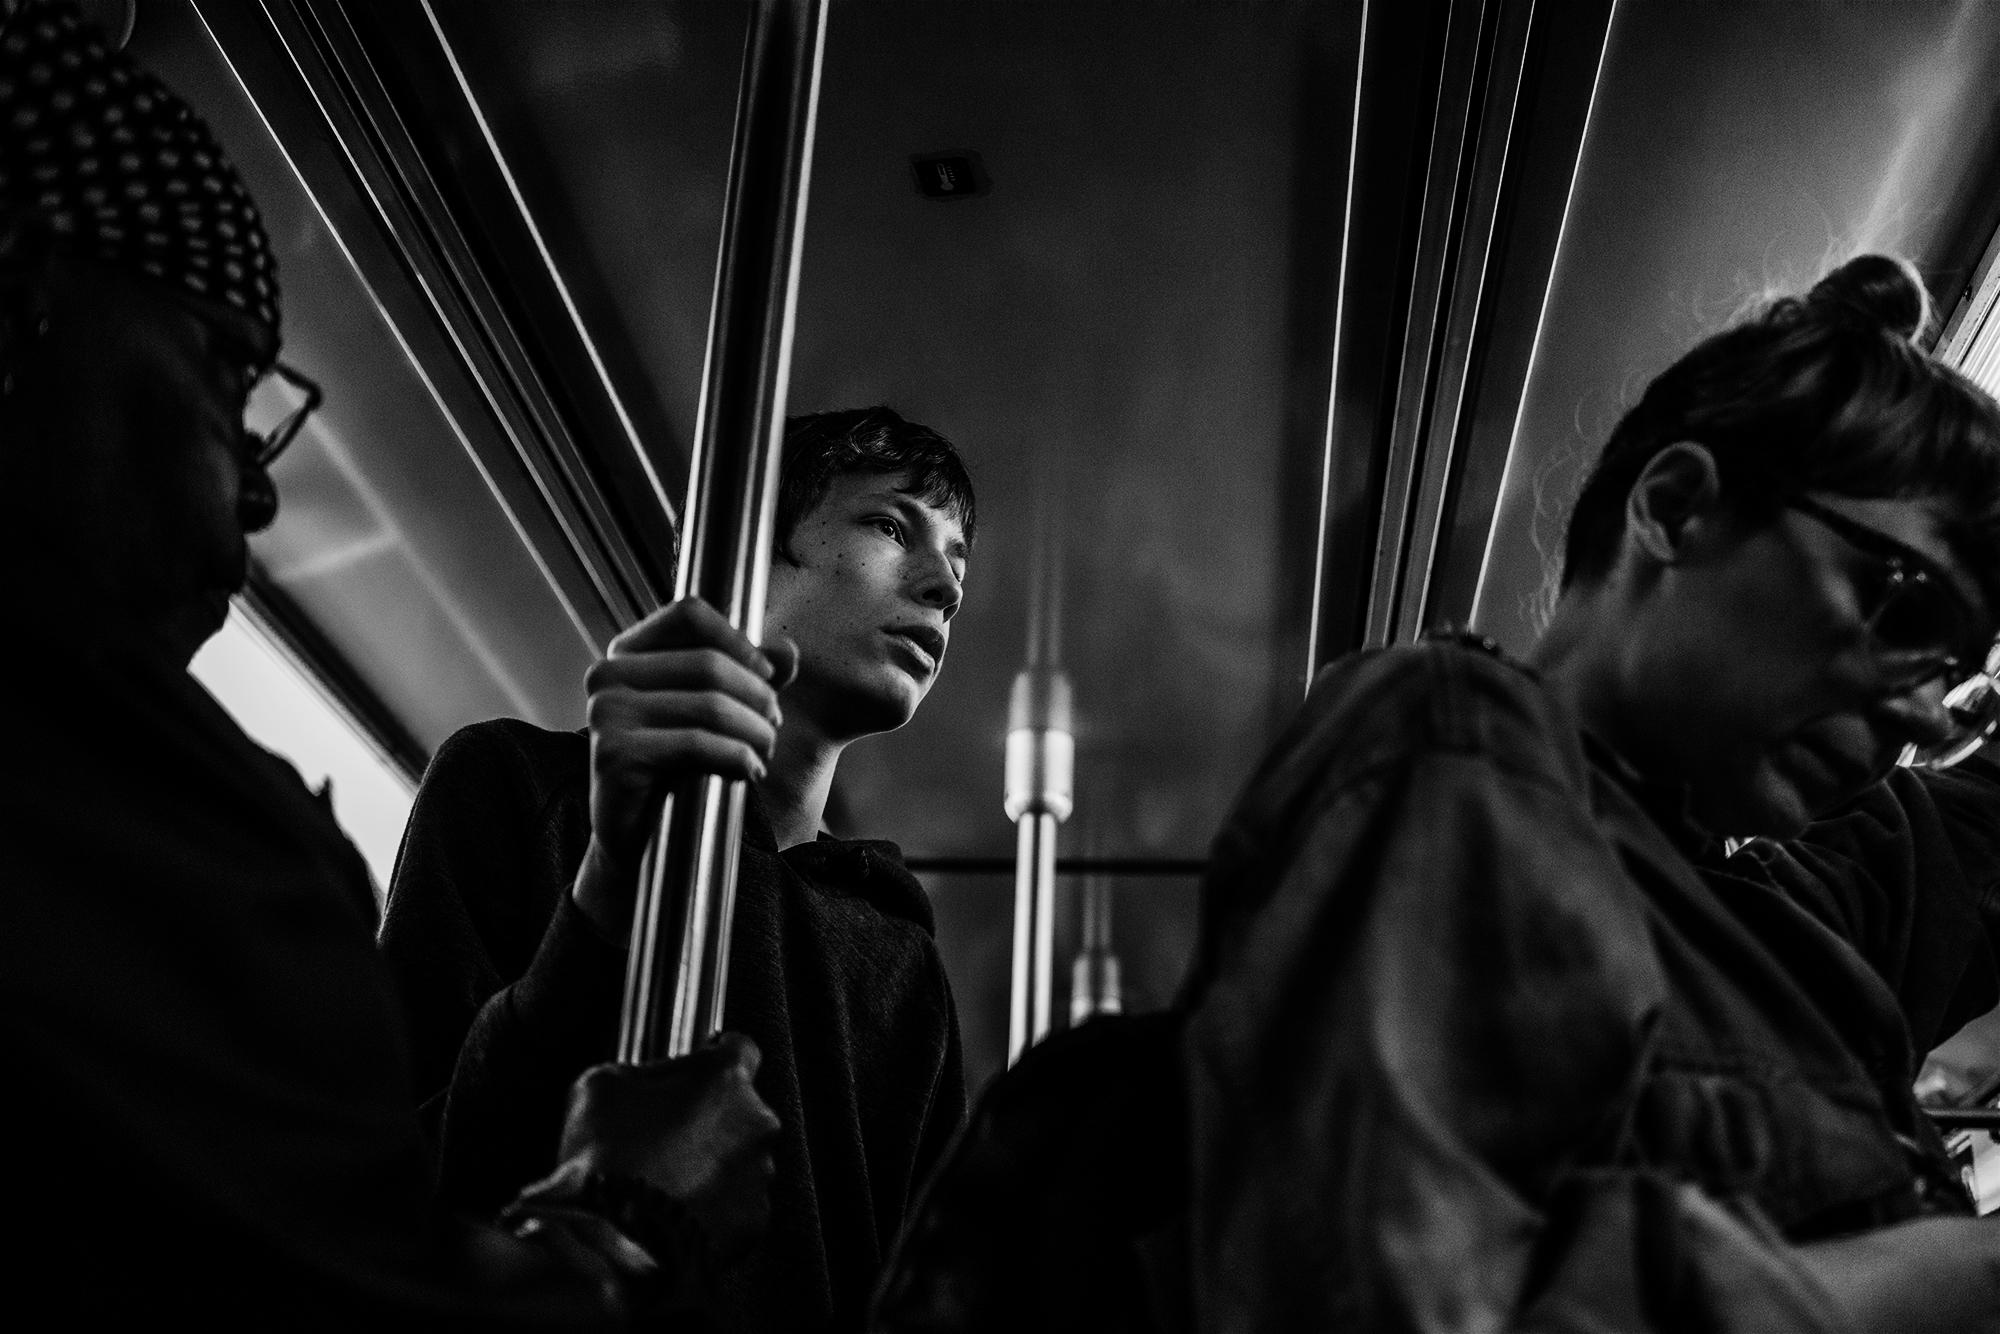 NYC_Subway_Beautiful_Boy_2017-012.jpg